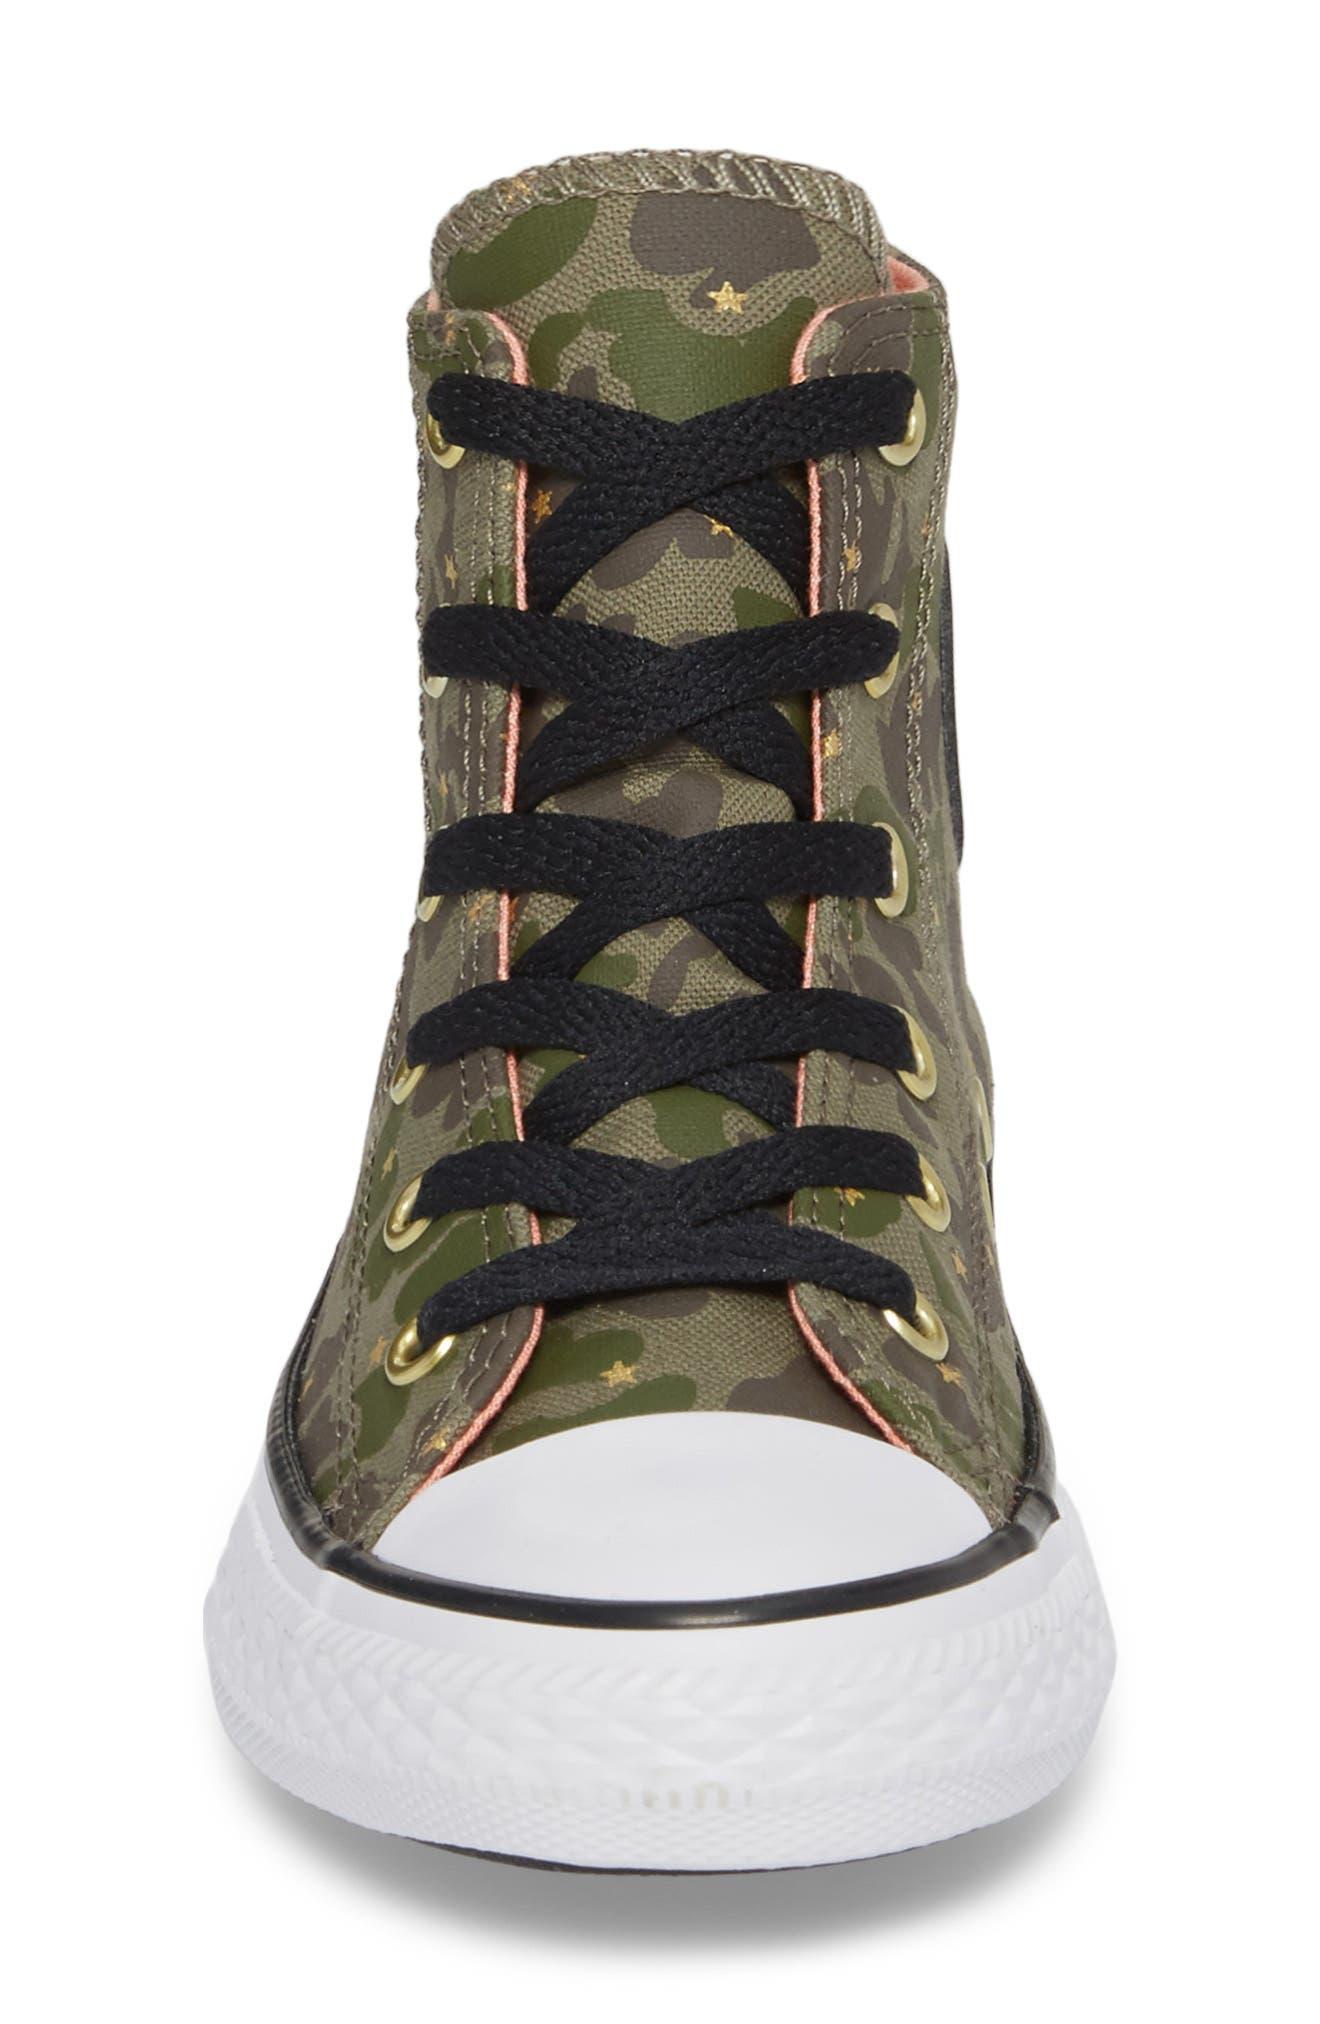 Camo High Top Sneaker,                             Alternate thumbnail 4, color,                             Surplus